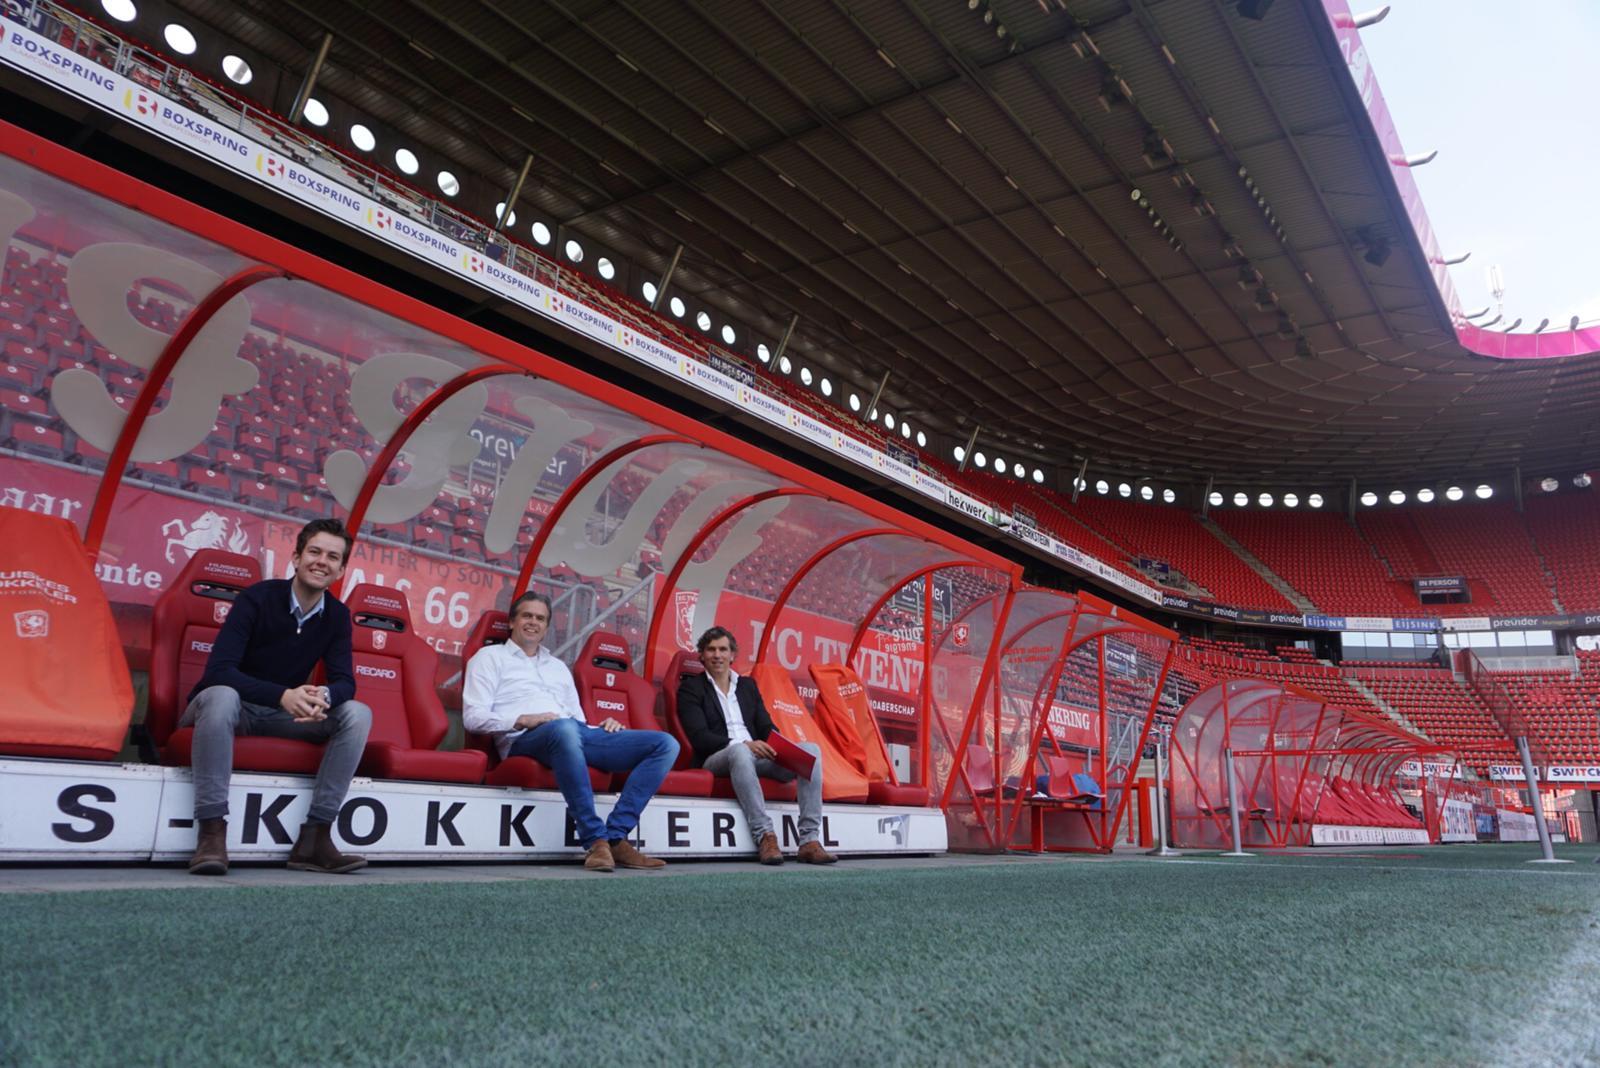 iQ Makelaars & 123Wonen komend seizoen sponsor FC Twente!